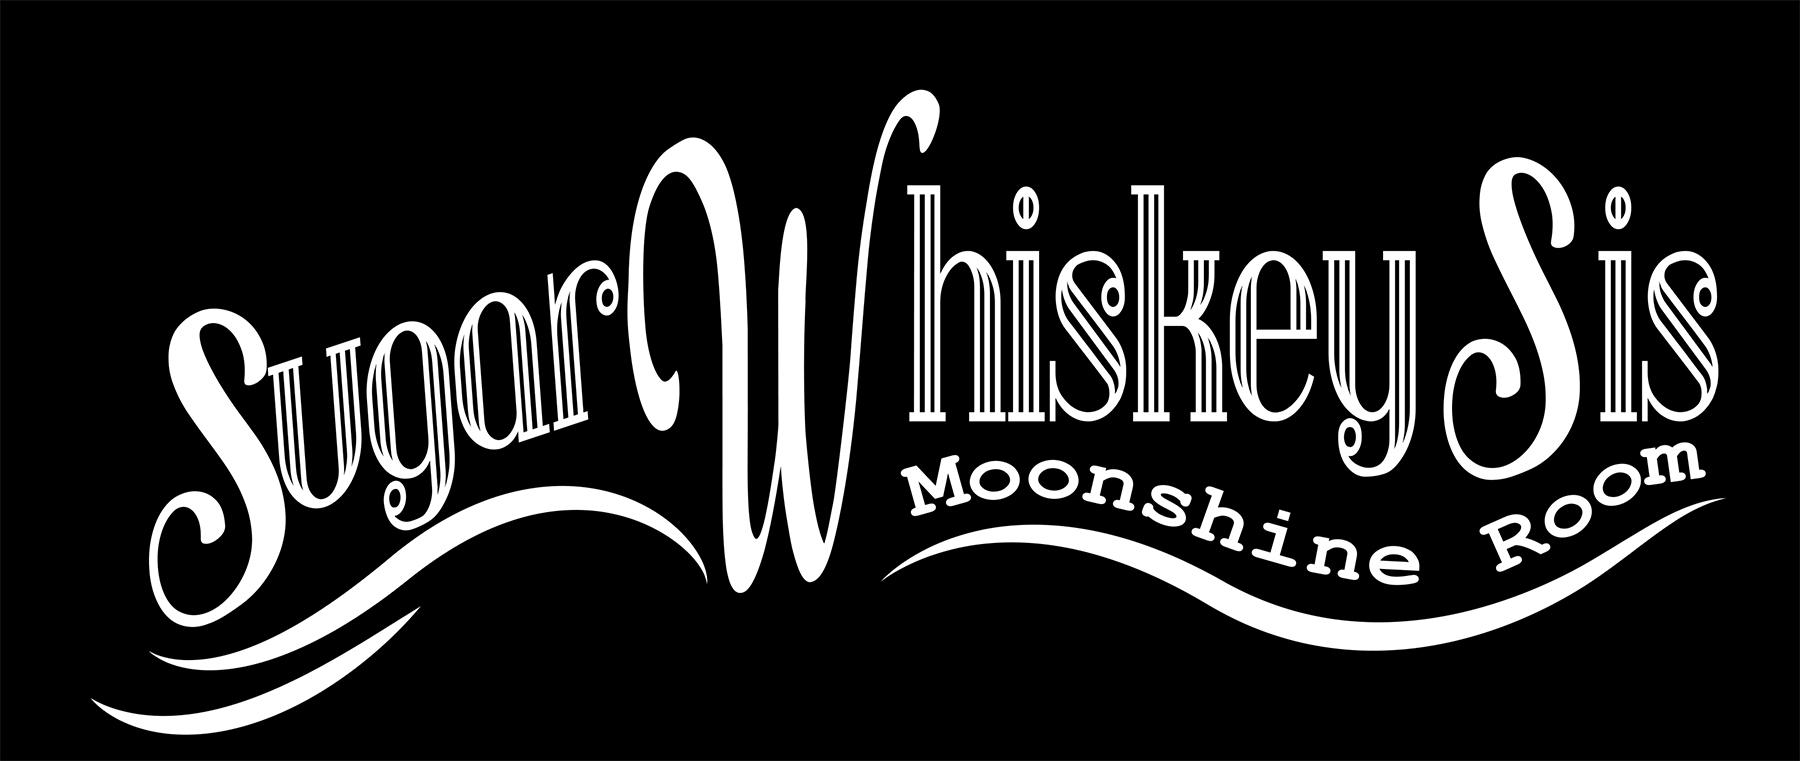 Sugar Whiskey Sis logo final.jpg